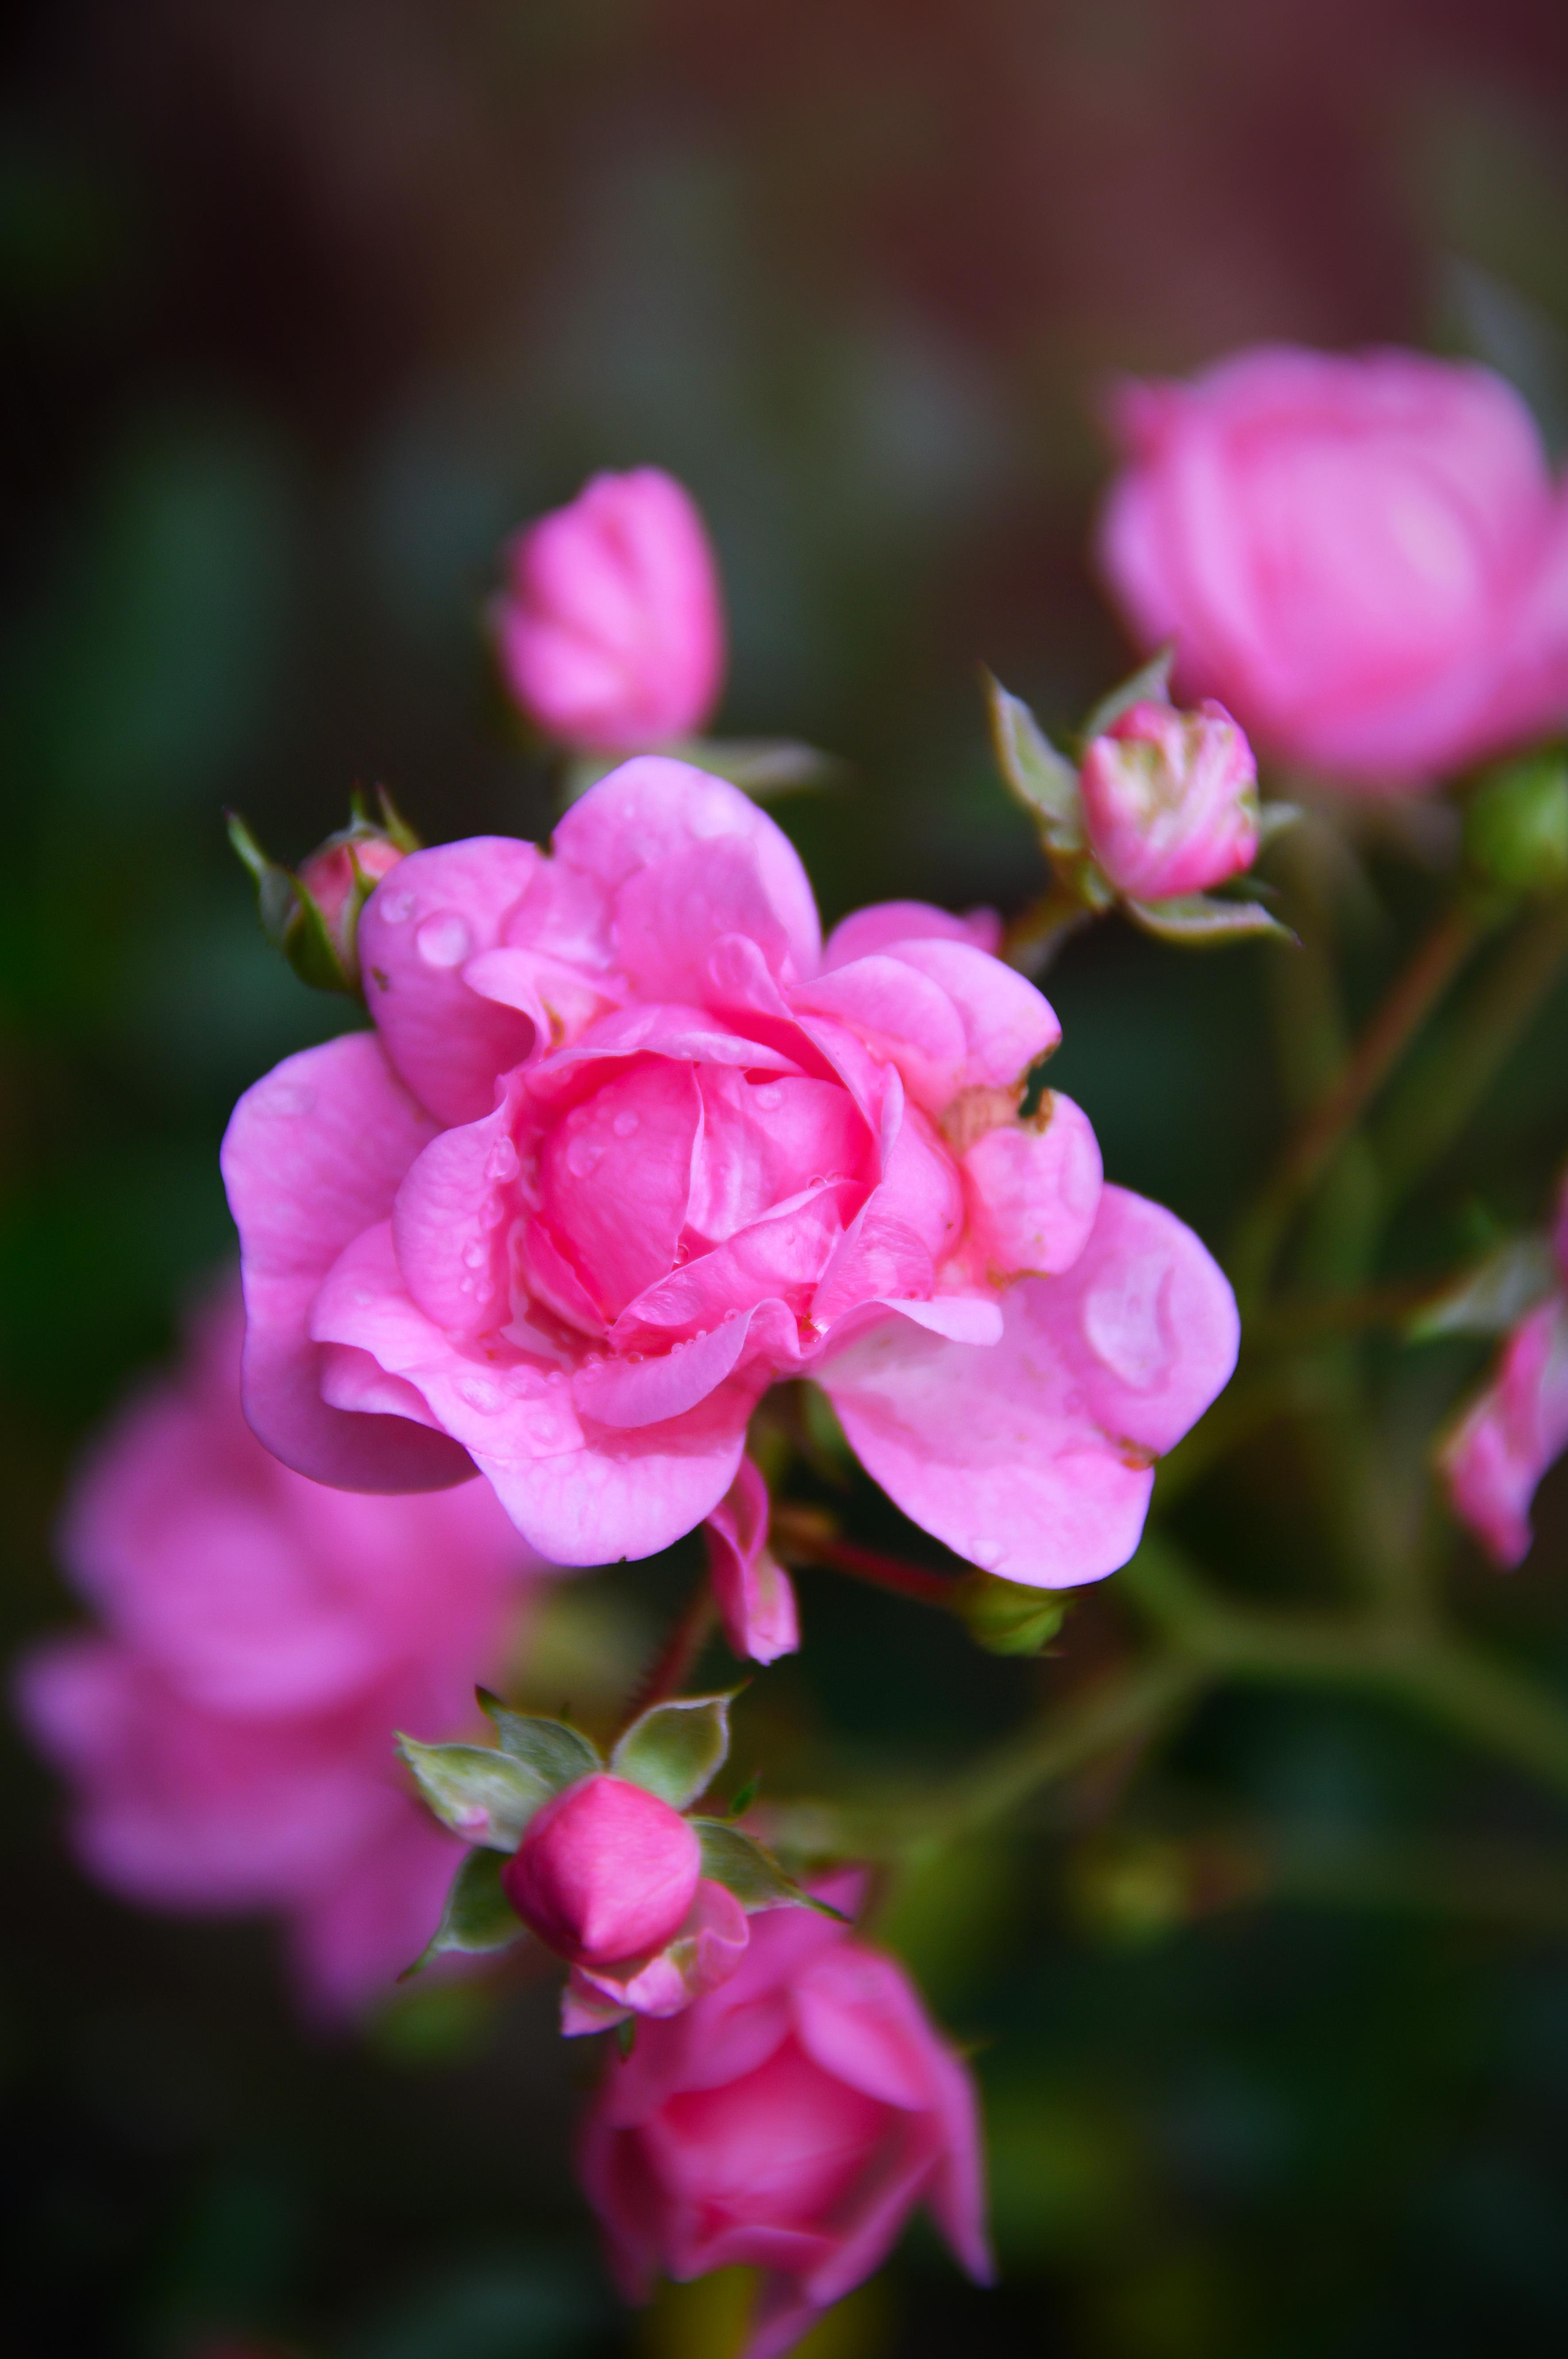 Free Images Flower Pink Flora Flowering Plant Rose